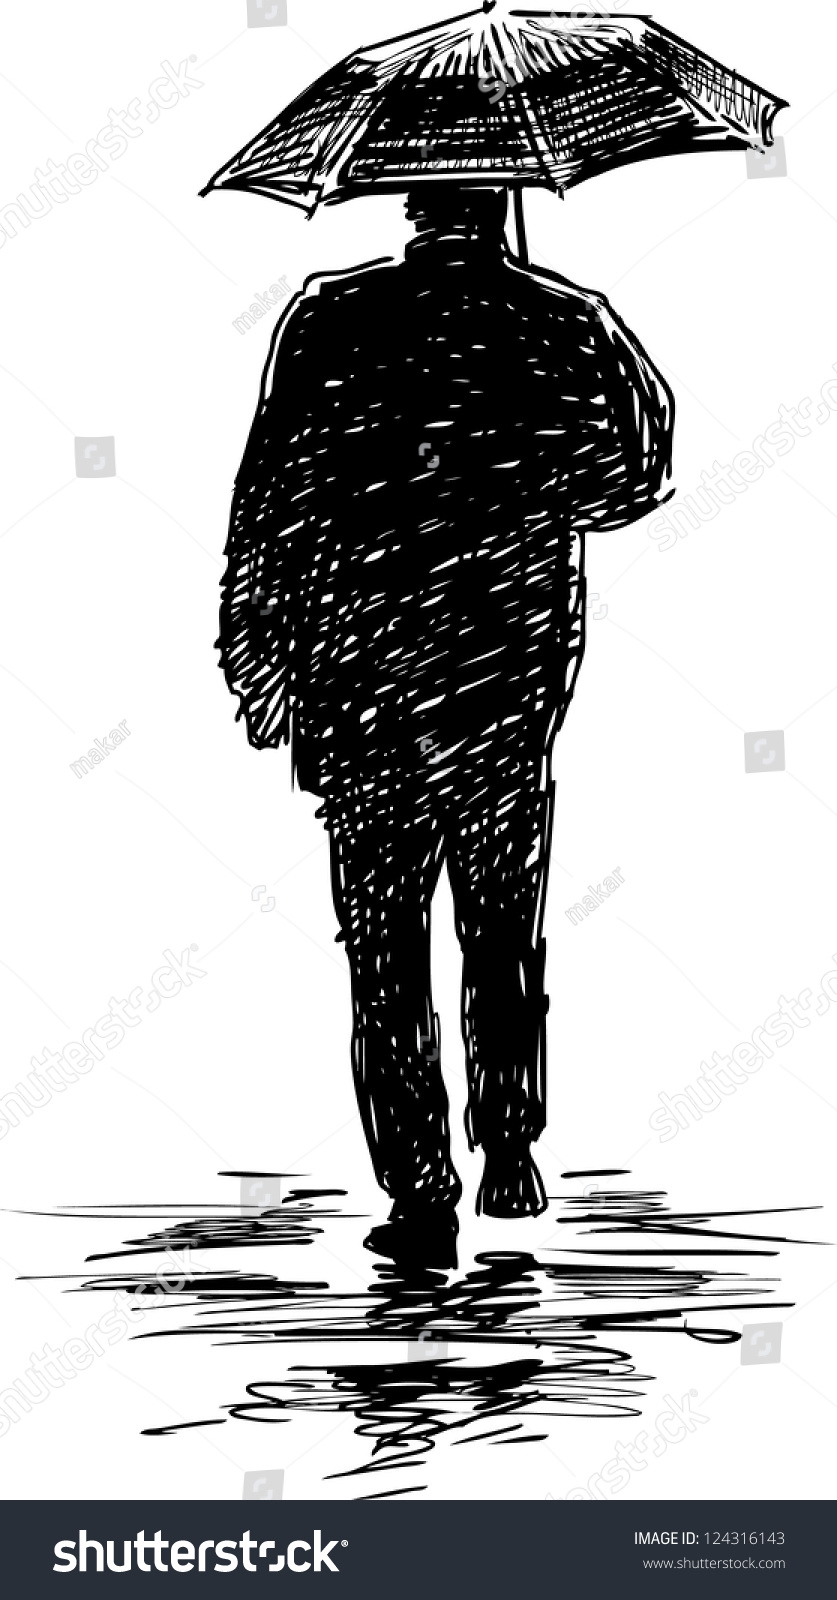 silhouette man under umbrella stock vector royalty free 124316143